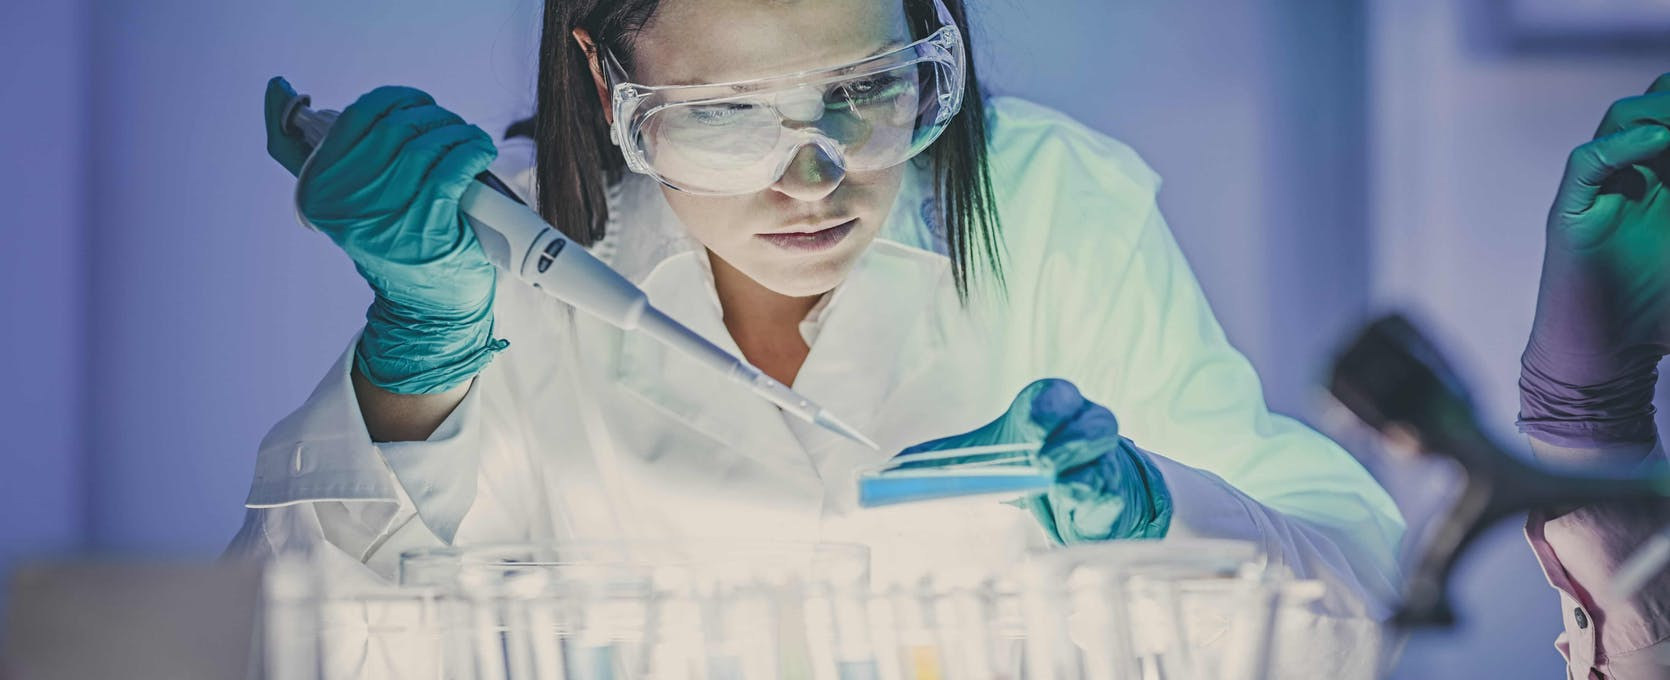 Scientist measures samples in a lab